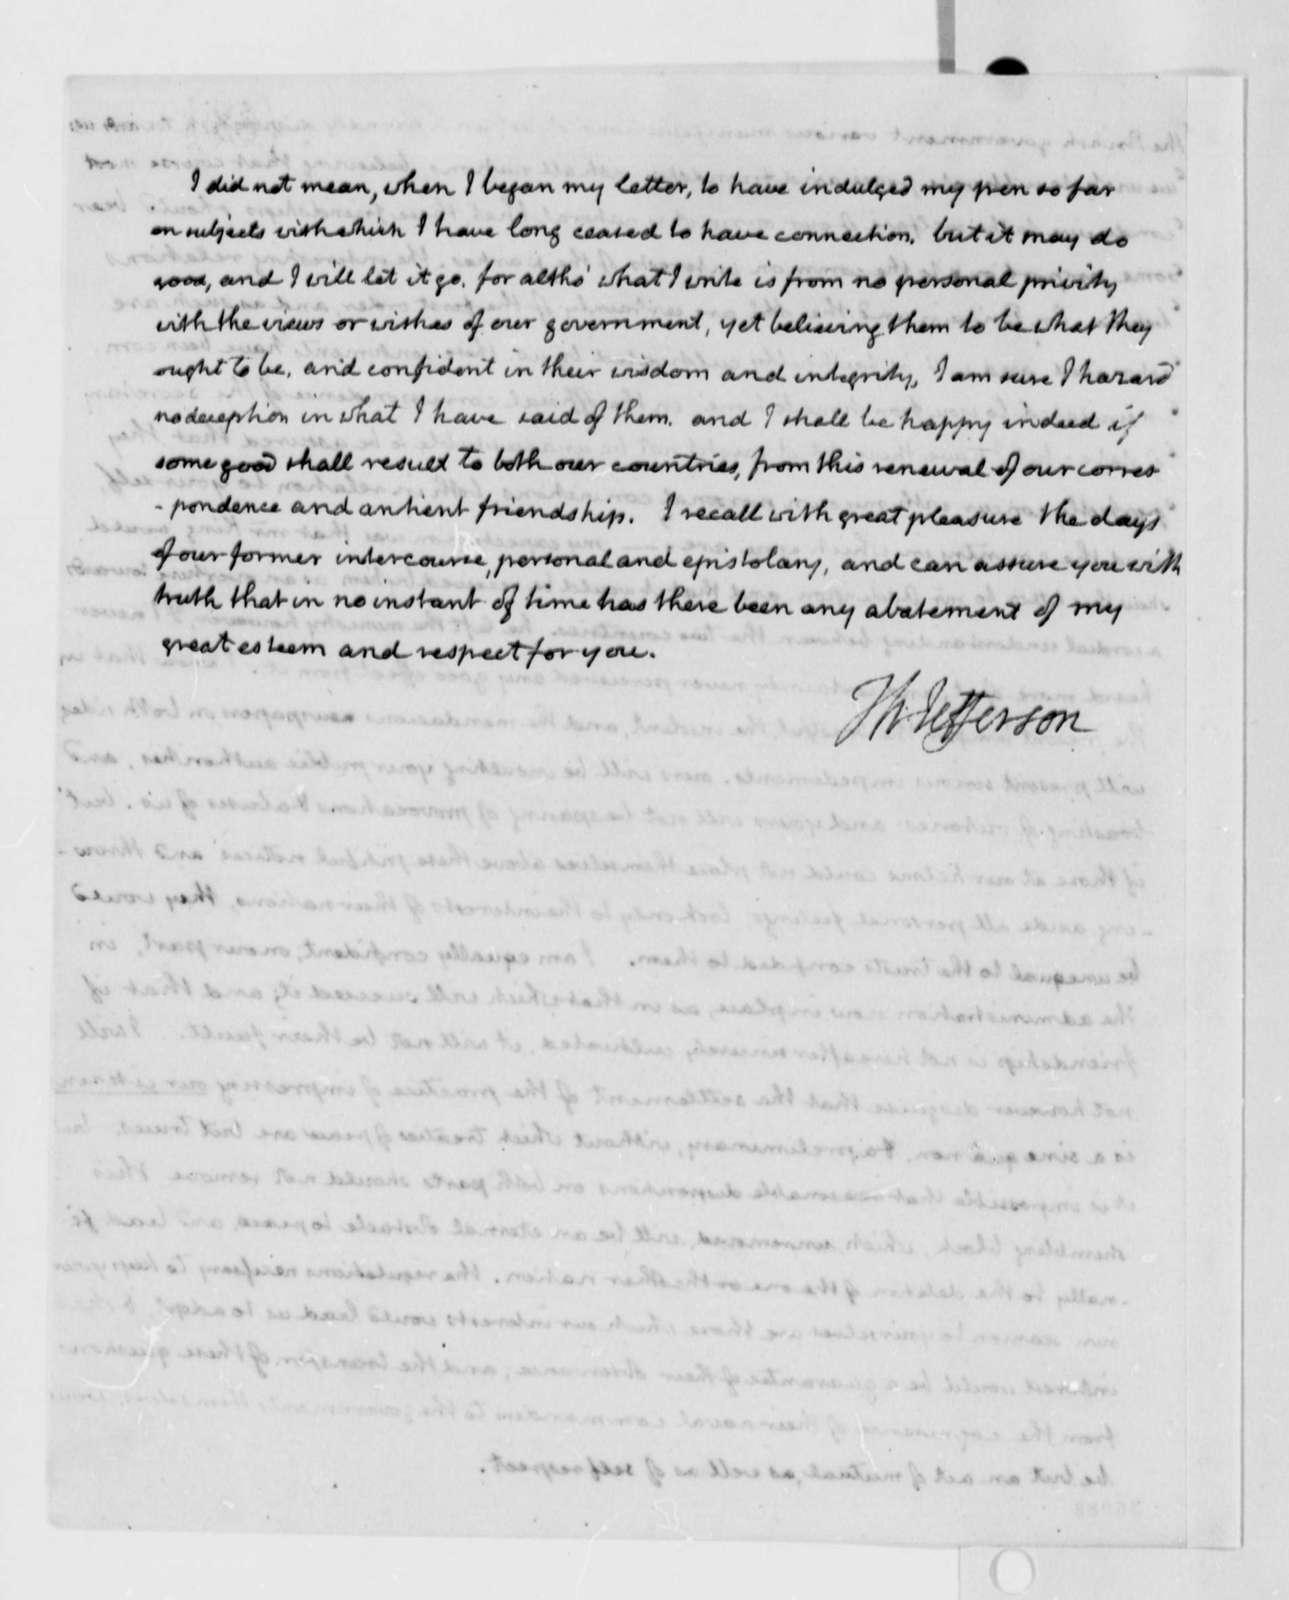 Thomas Jefferson to John Sinclair, July 31, 1816